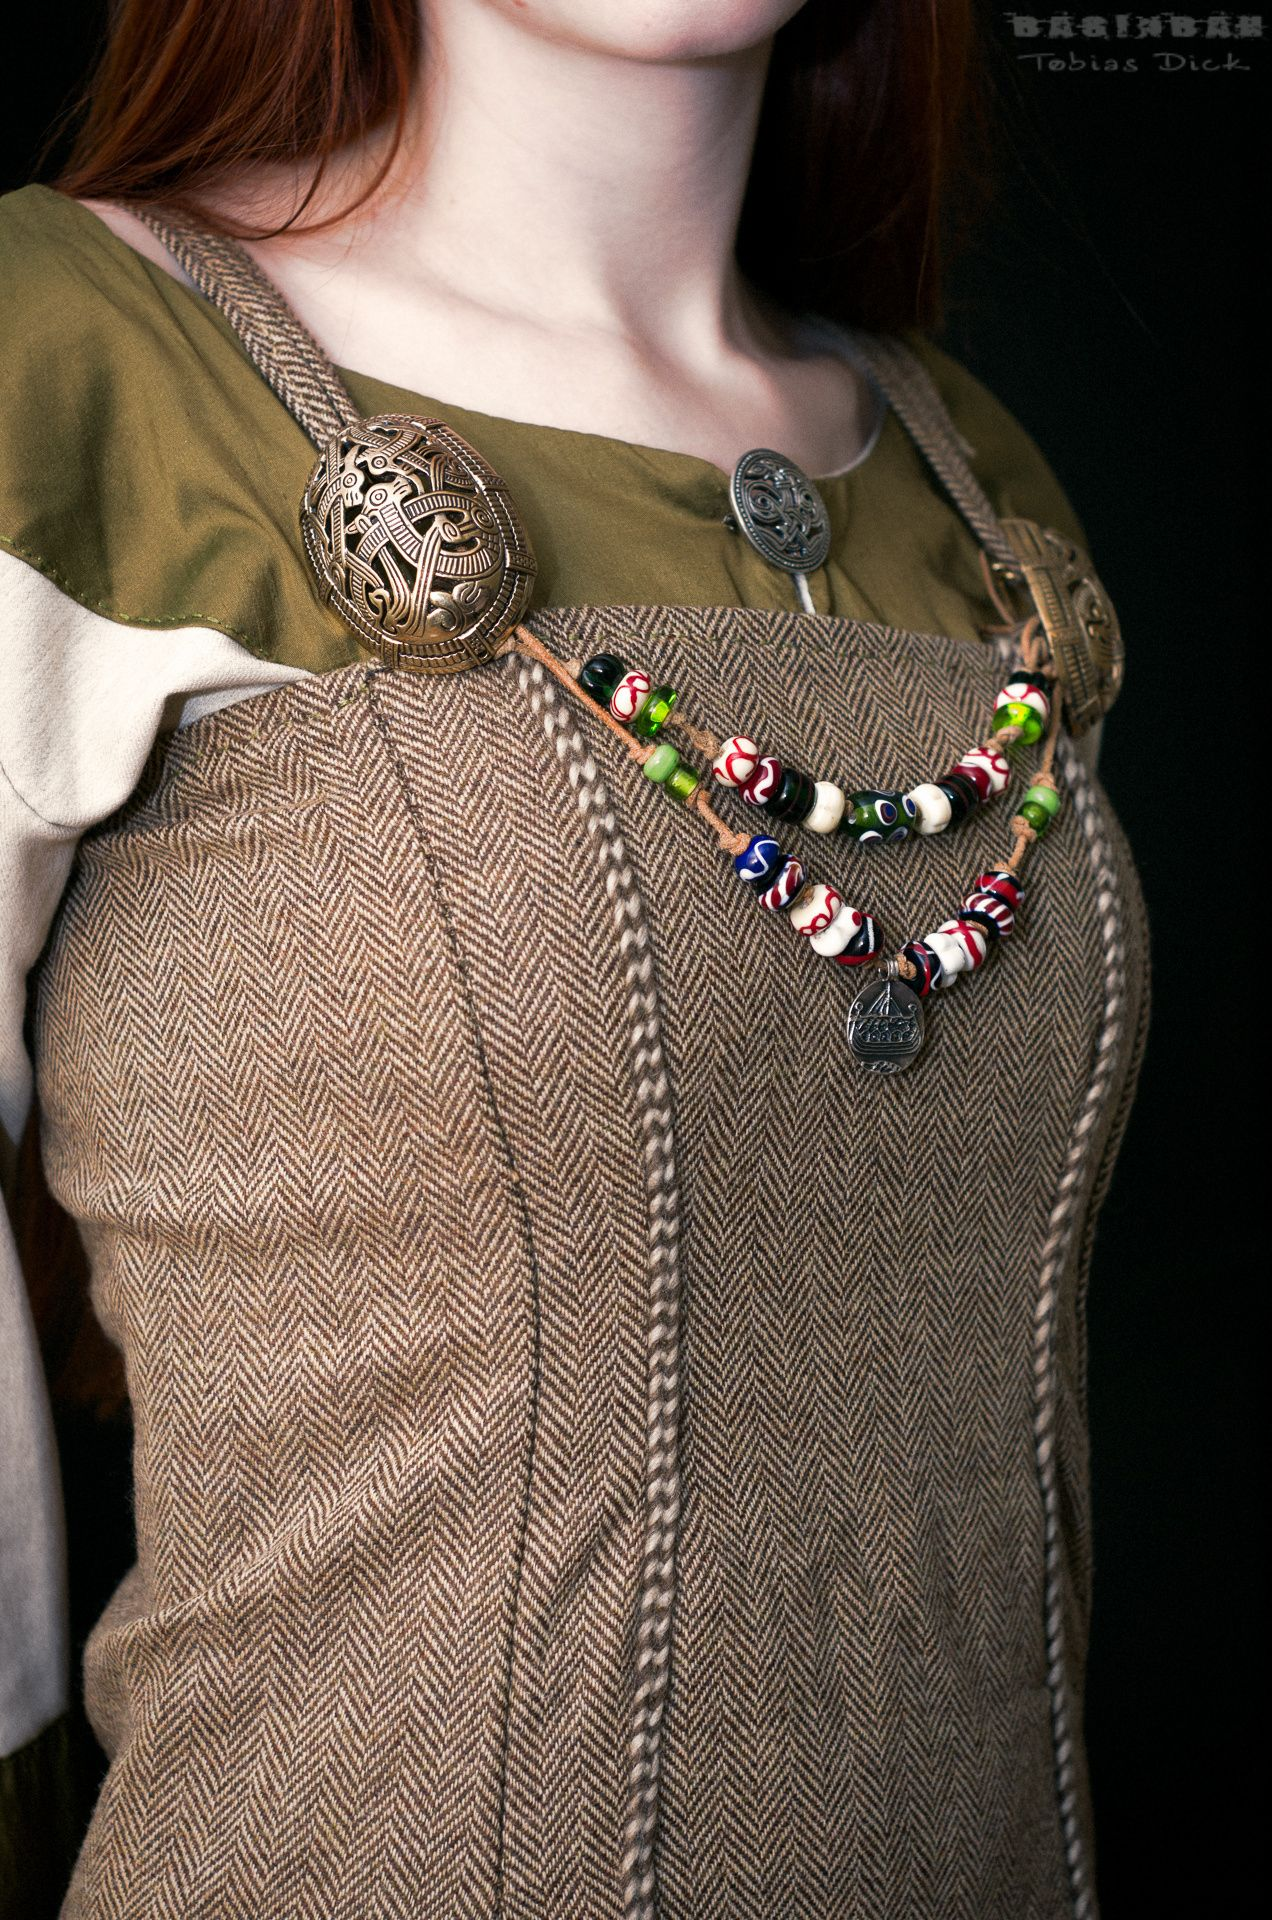 Viking garb by Tobias Dick on 500px